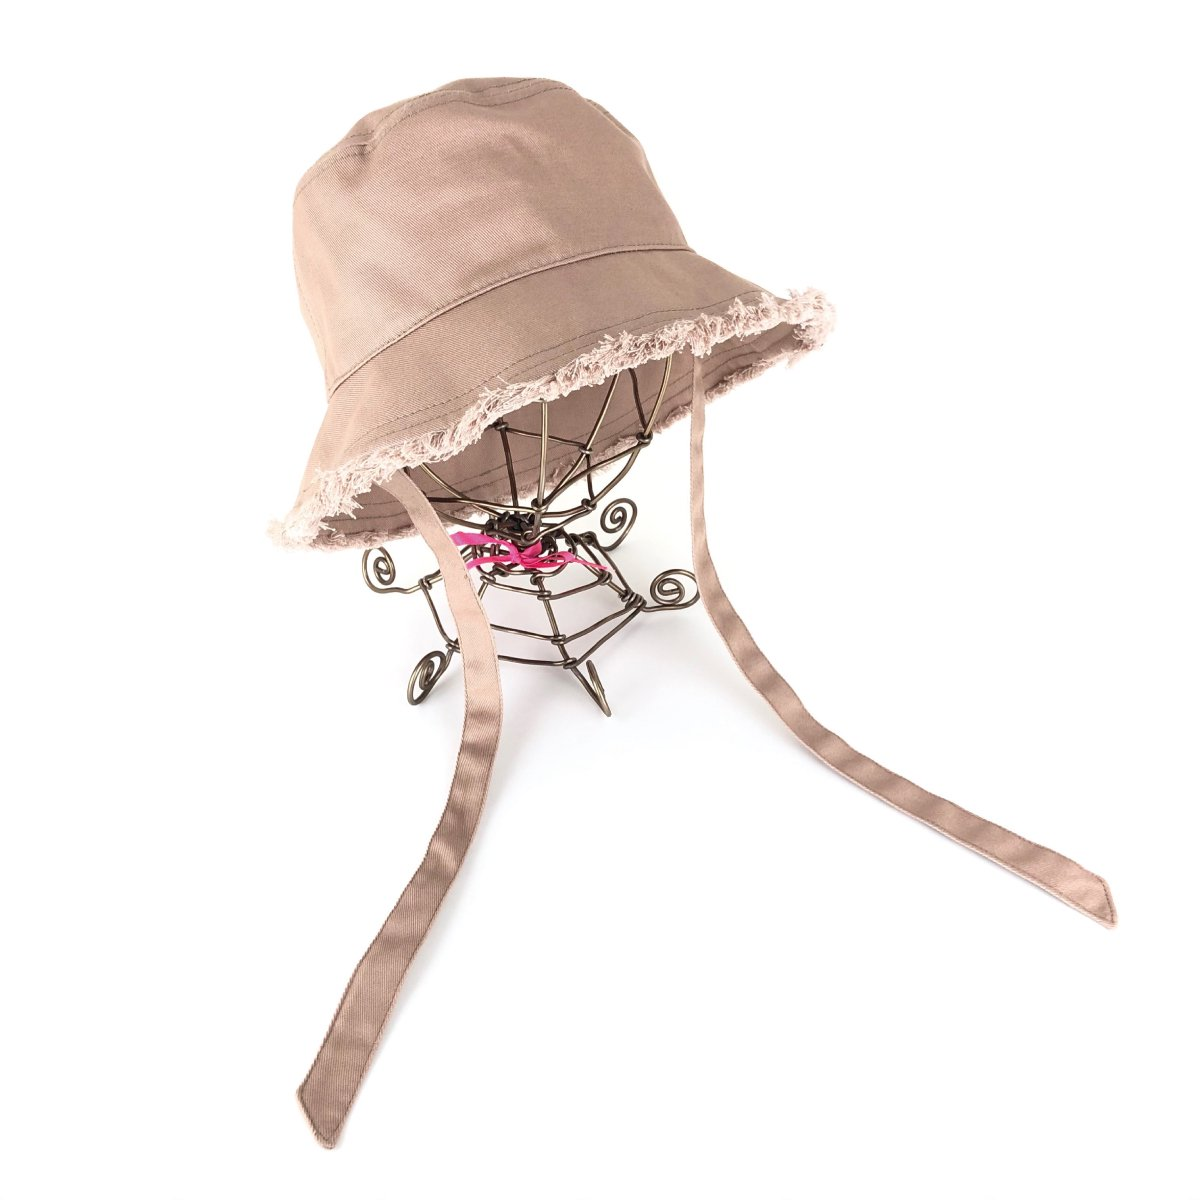 【BABY】Baby Fringe Hat 詳細画像6